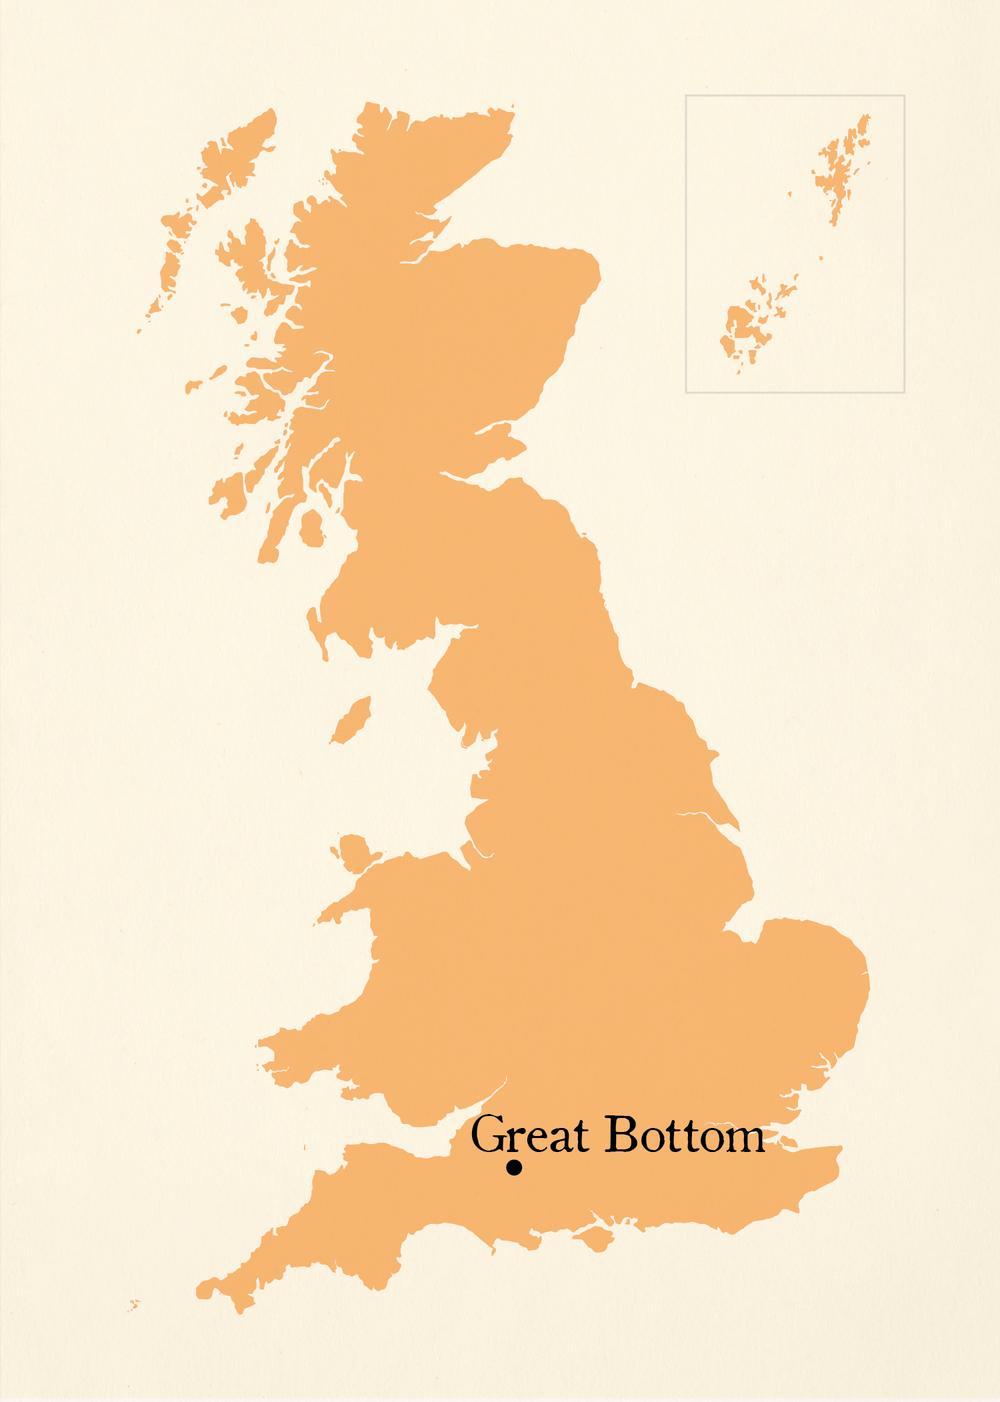 Great Bottom